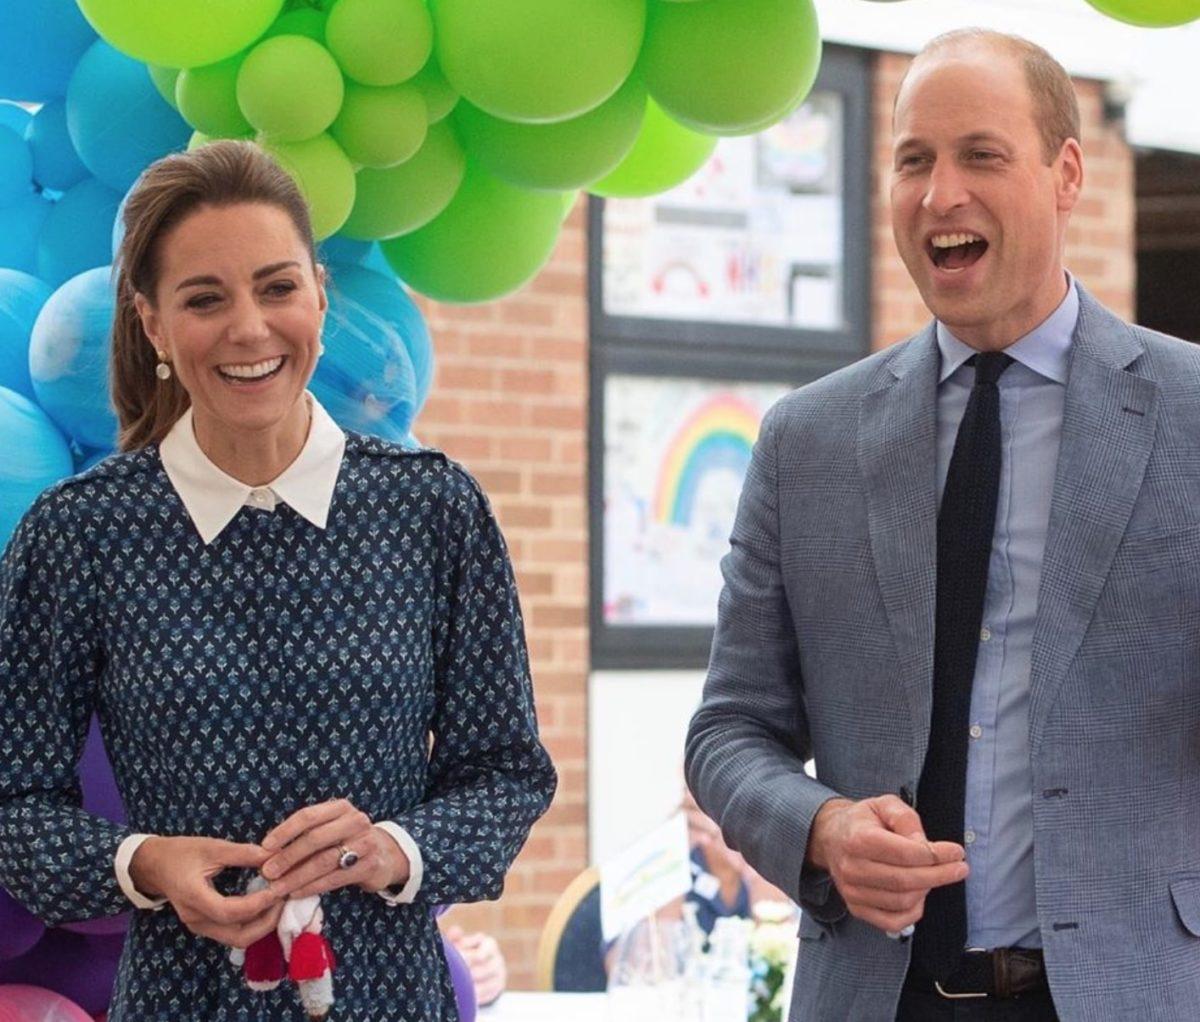 Kate Middleton Shares Prince George's 7th Birthday Photos